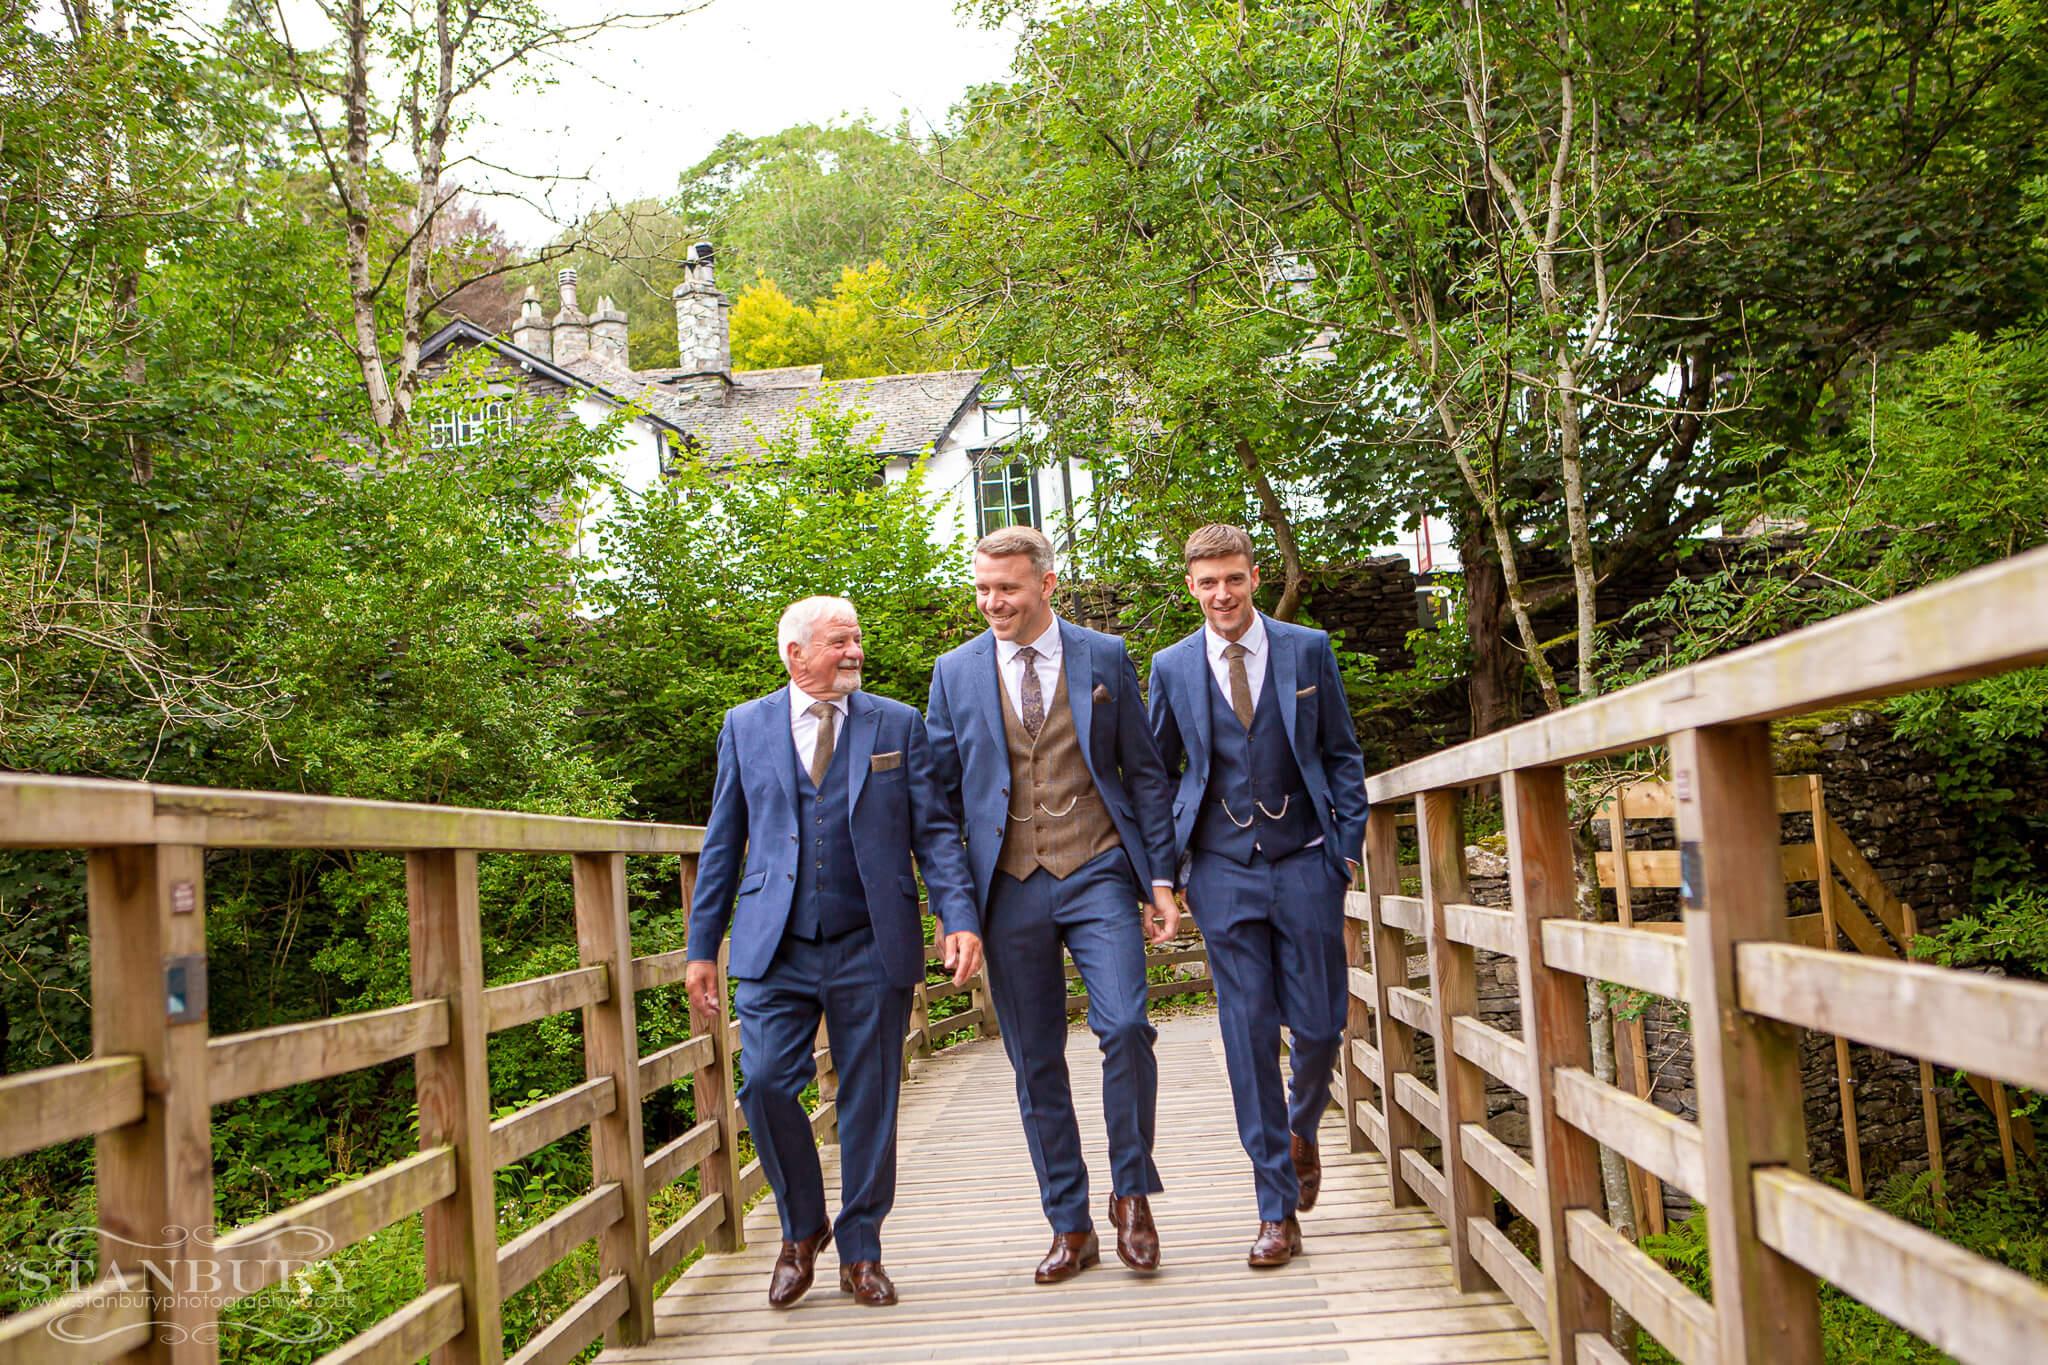 lake-district-groomsmen-wedding-photography